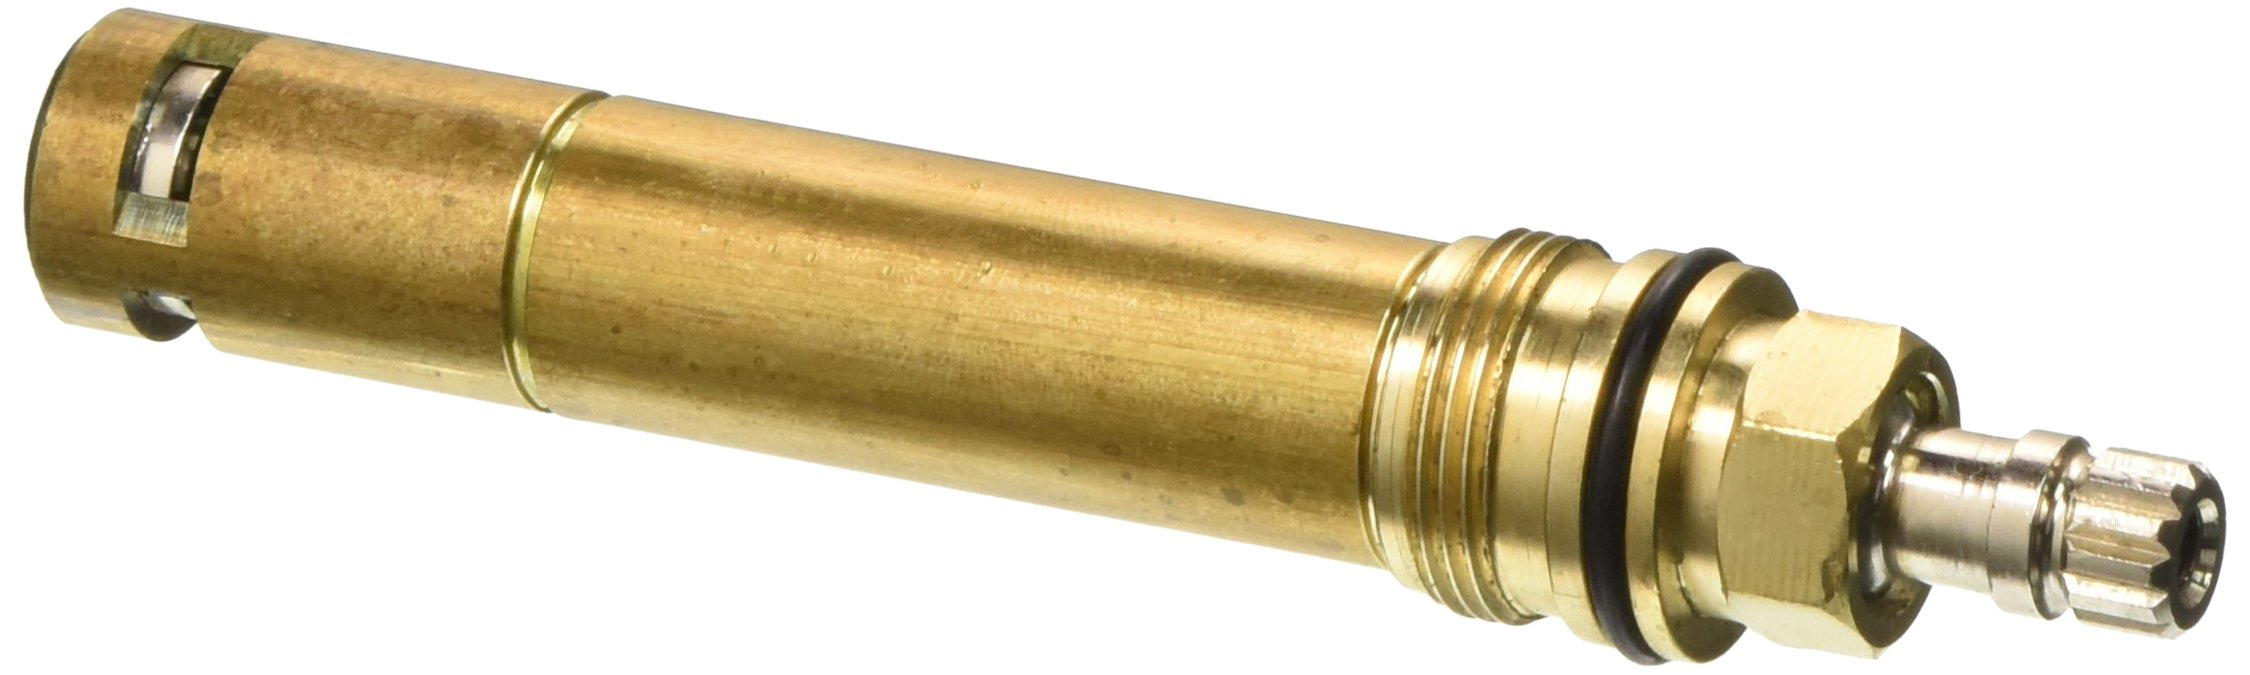 Danco 18596E Stem for Price Pfister Faucet